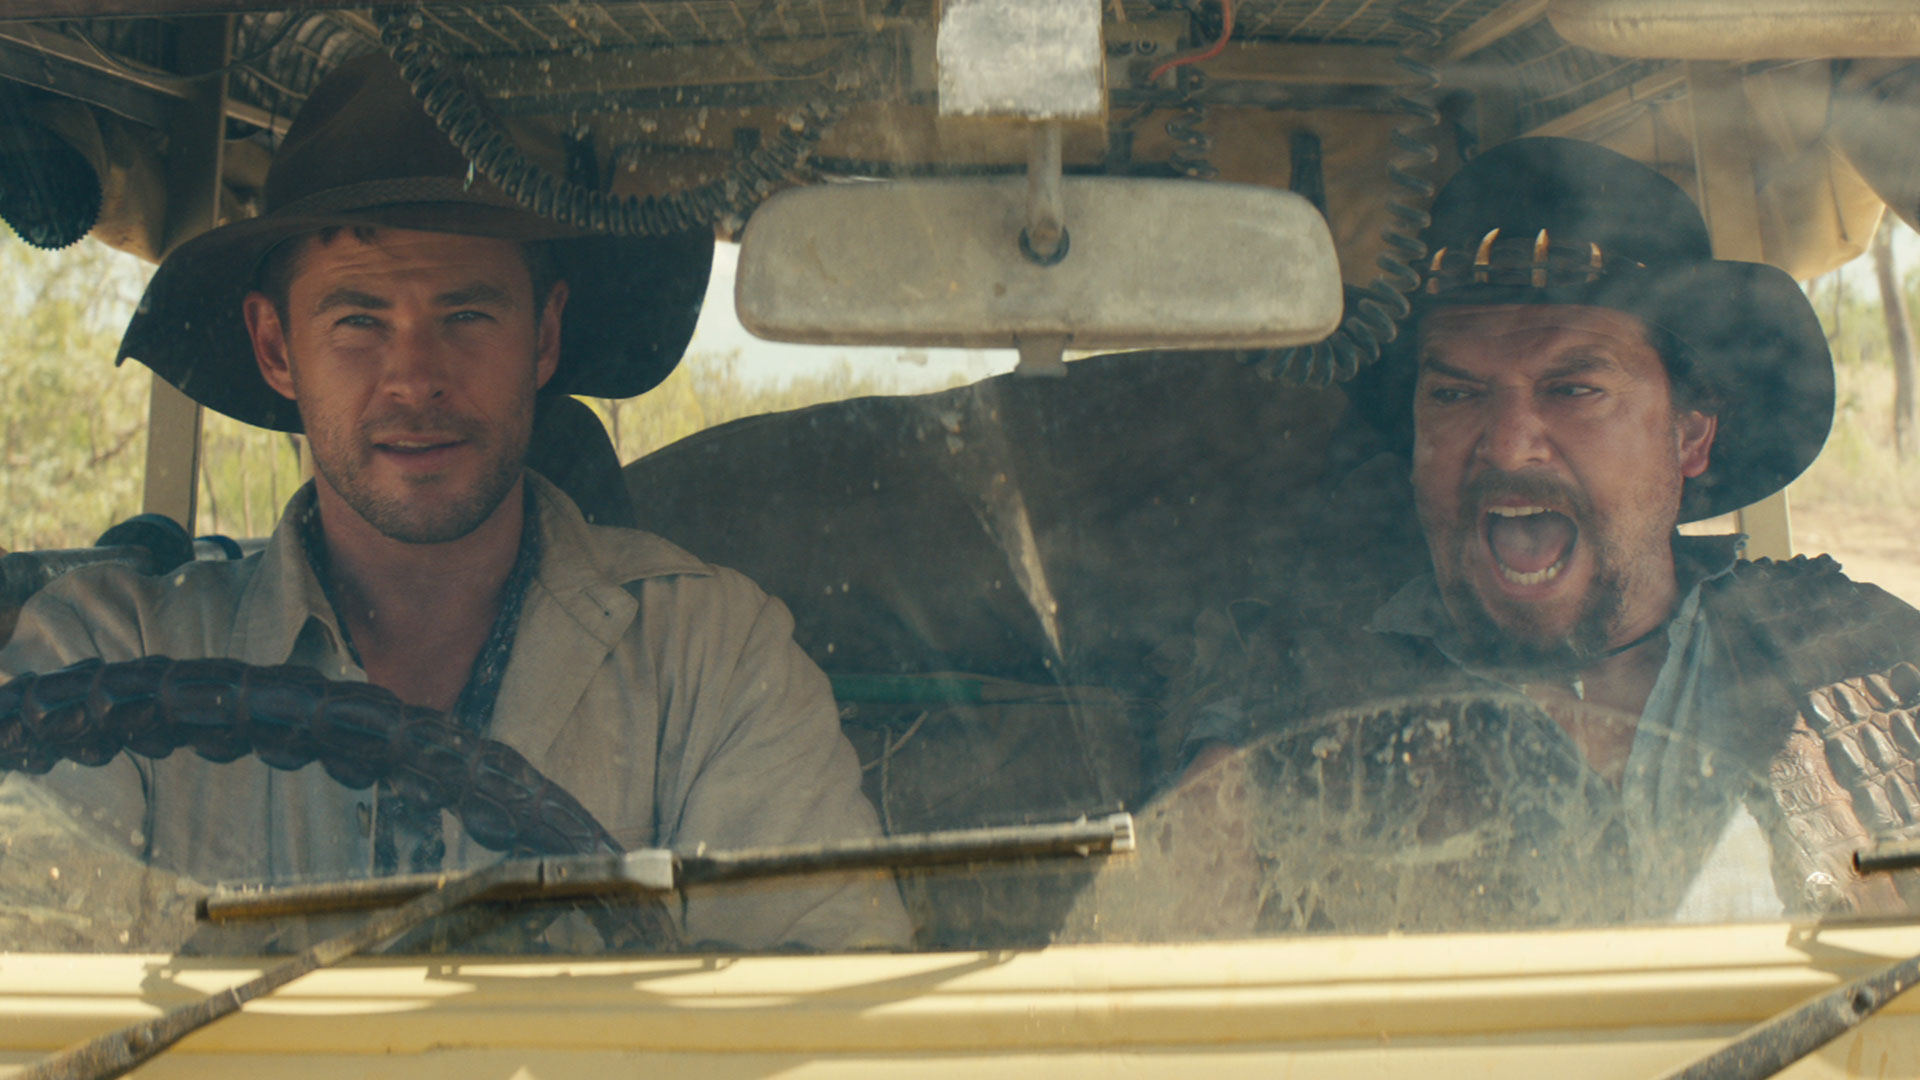 Chris Hemsworth and Danny McBride in a car